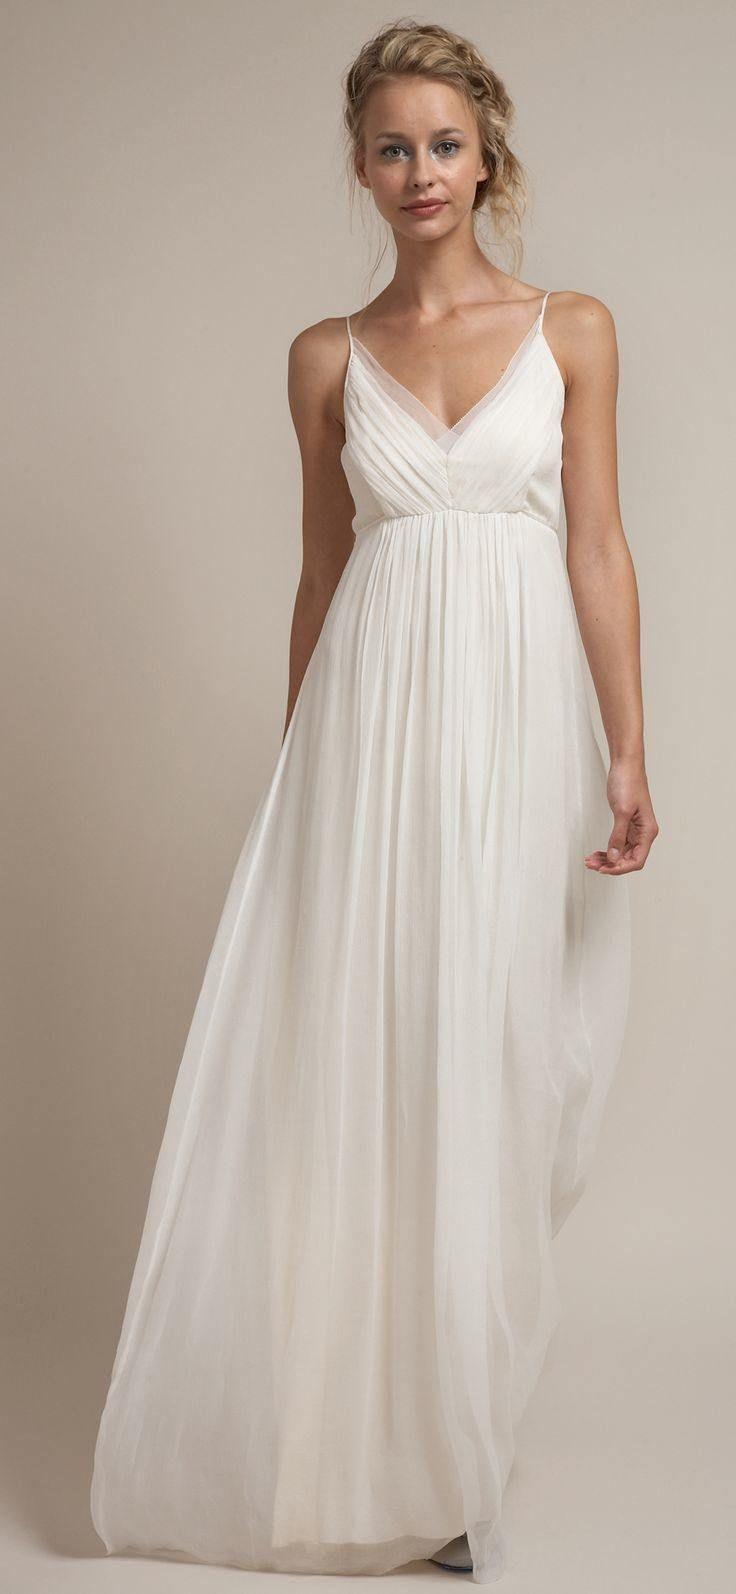 Beautiful Casual Wedding Dresses For The Minimalist Photo